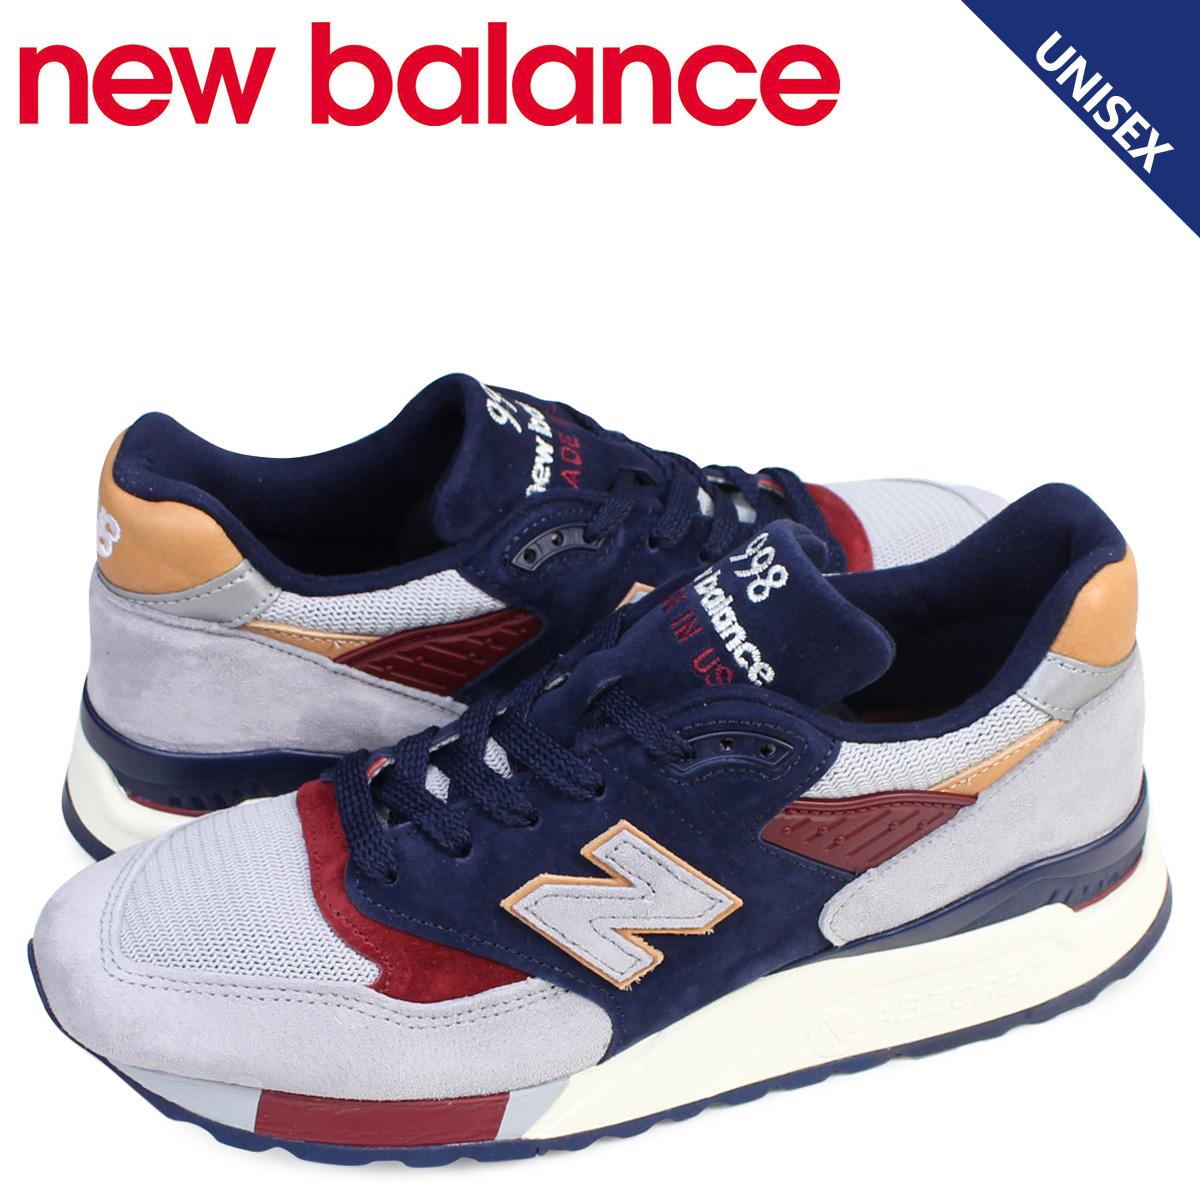 Sugar Online Shop | Rakuten Global Market: New Balance 998 men's ...